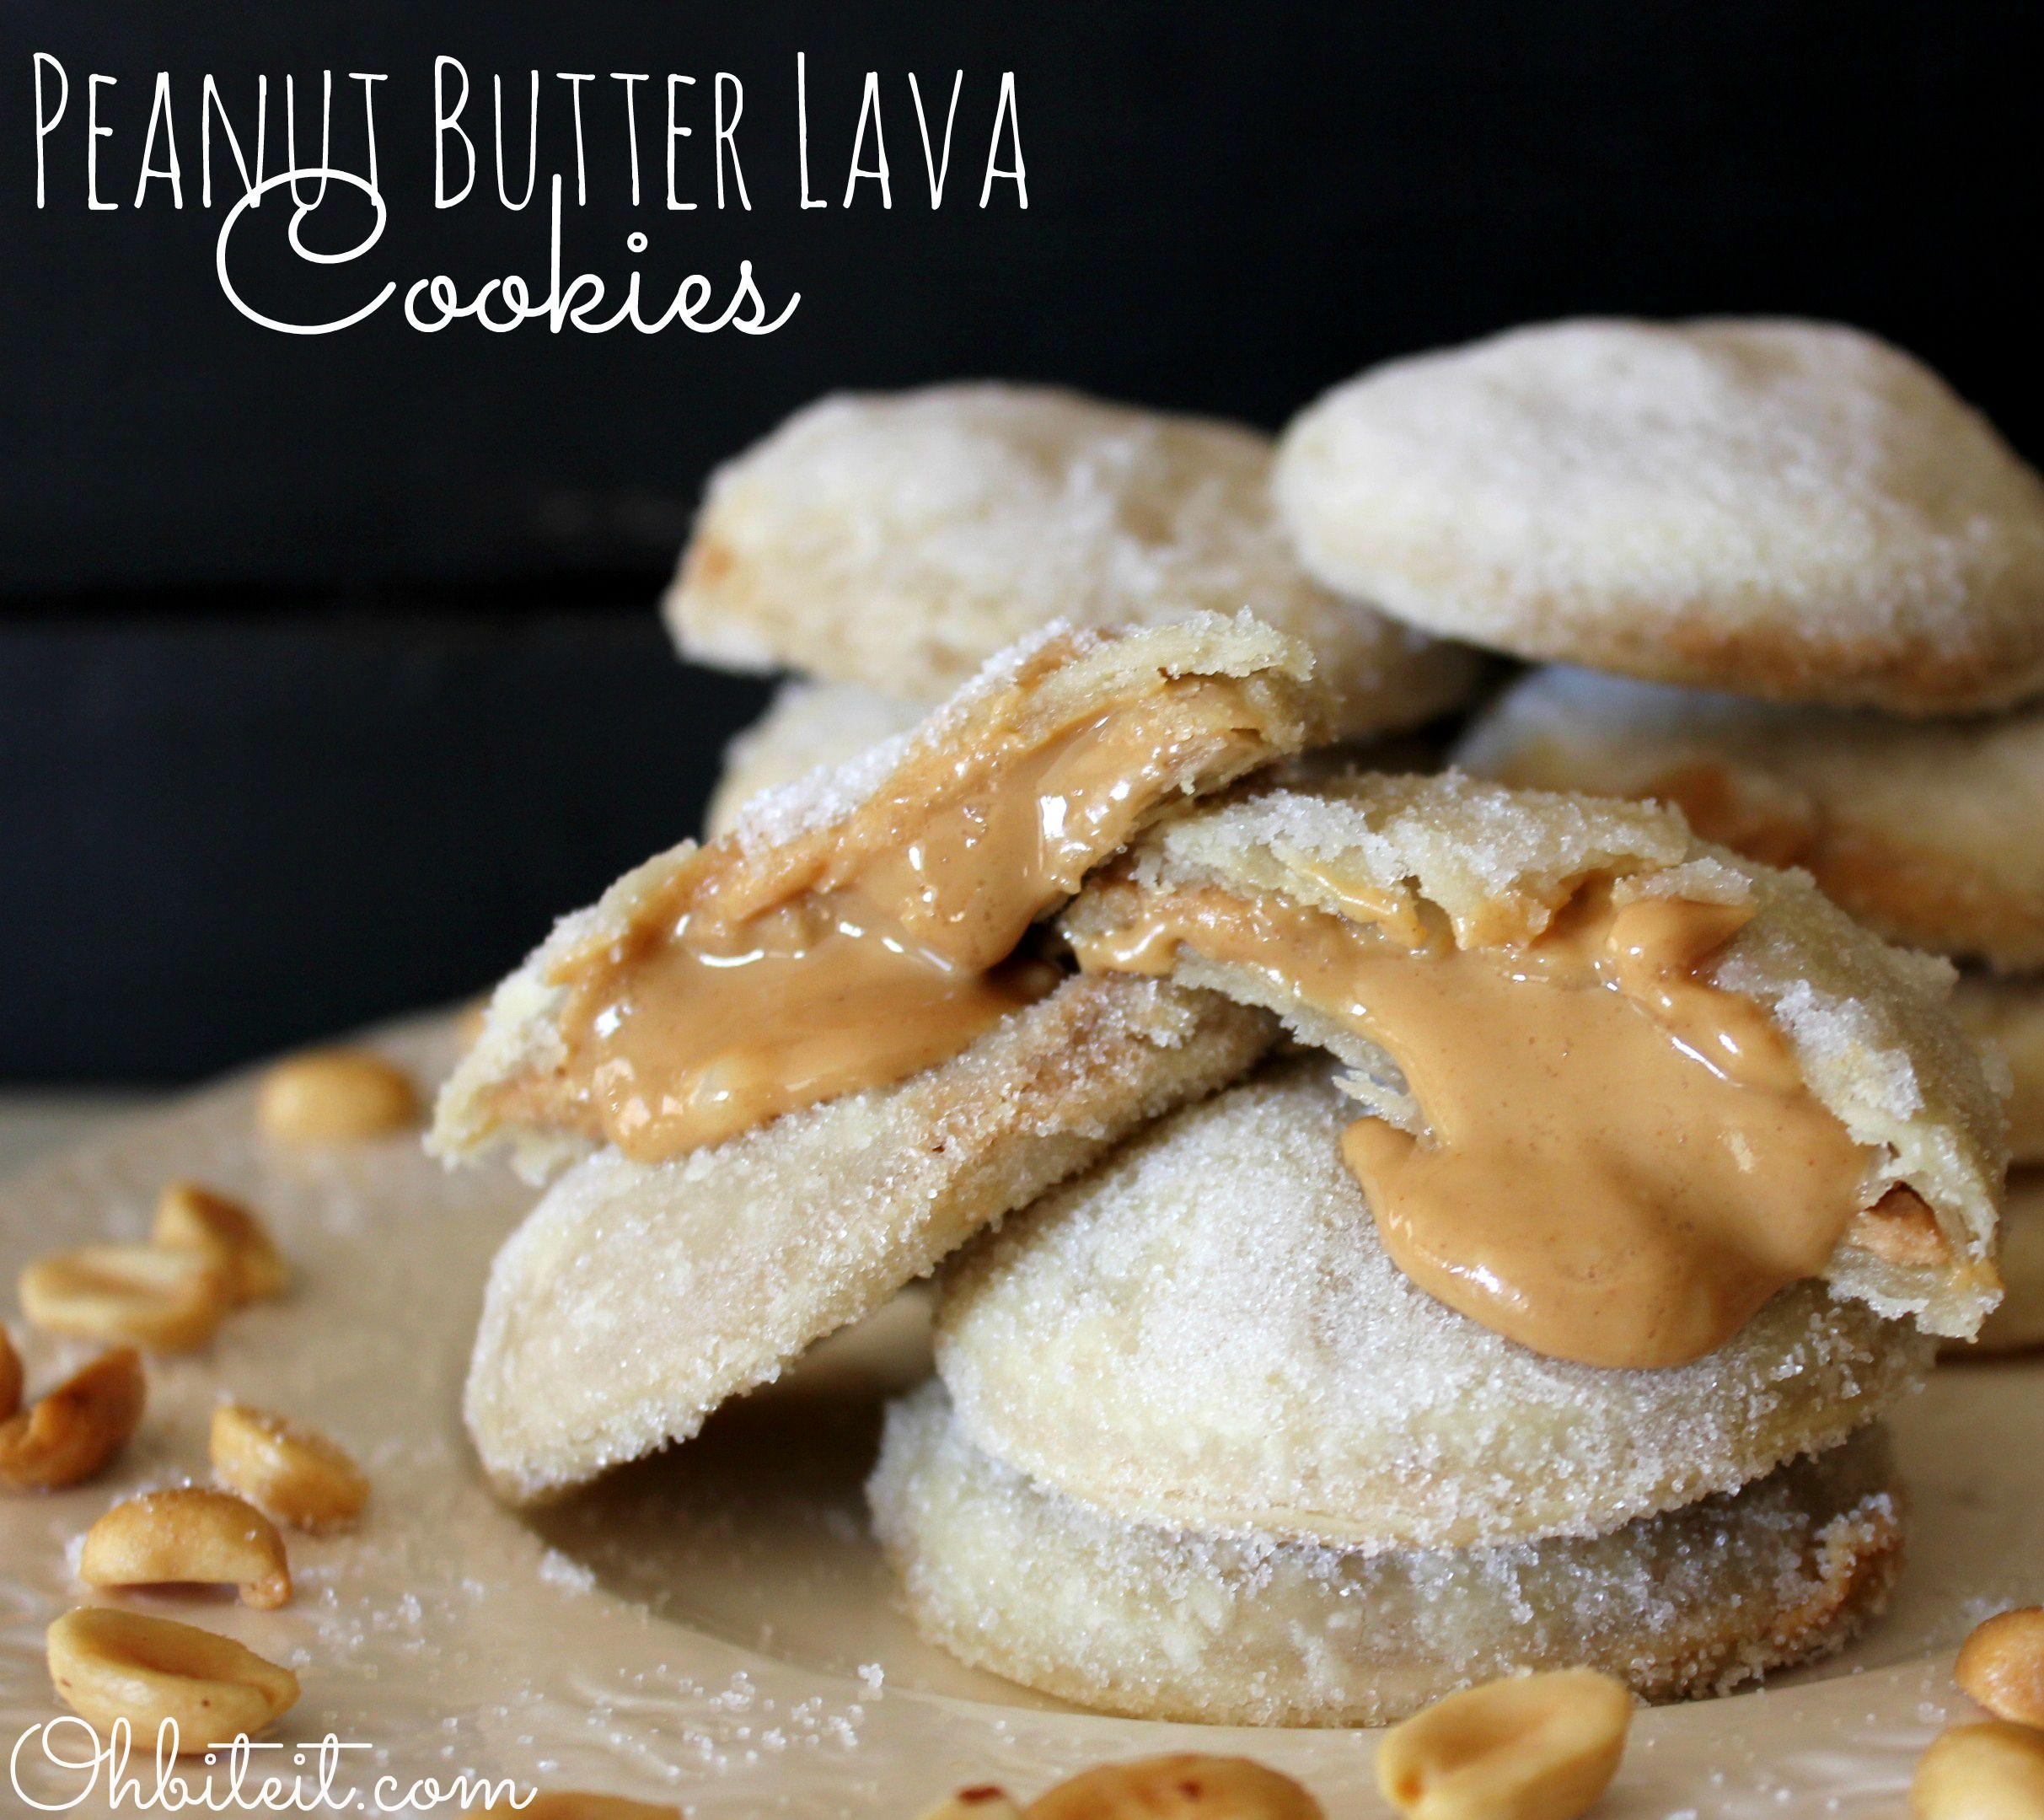 ~Peanut Butter Lava Cookies!